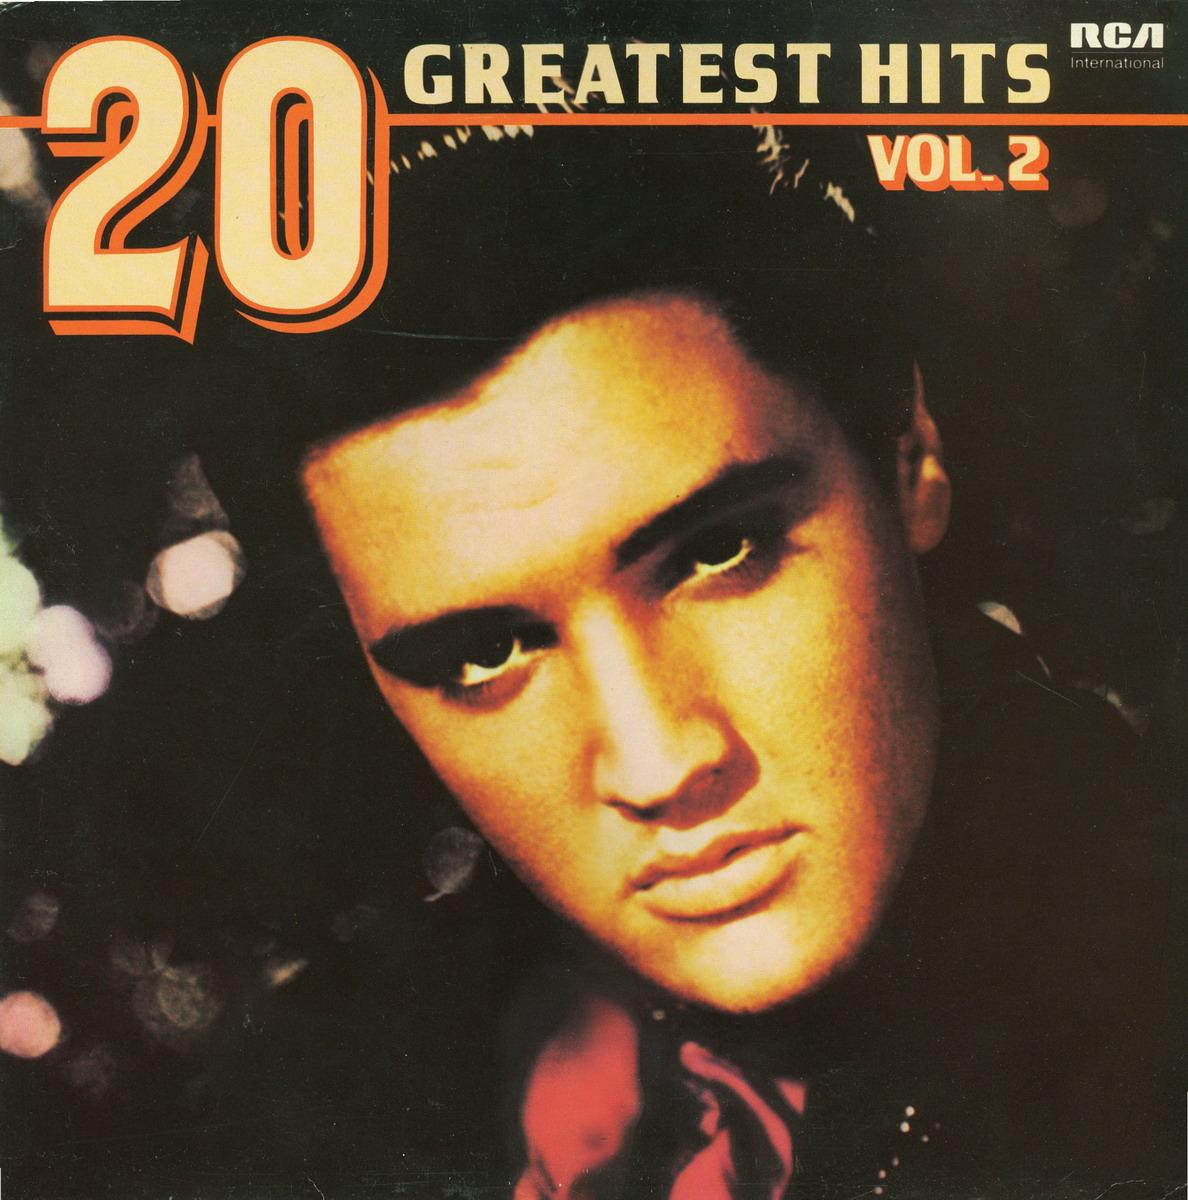 20 GREATEST HITS VOL 2 LP